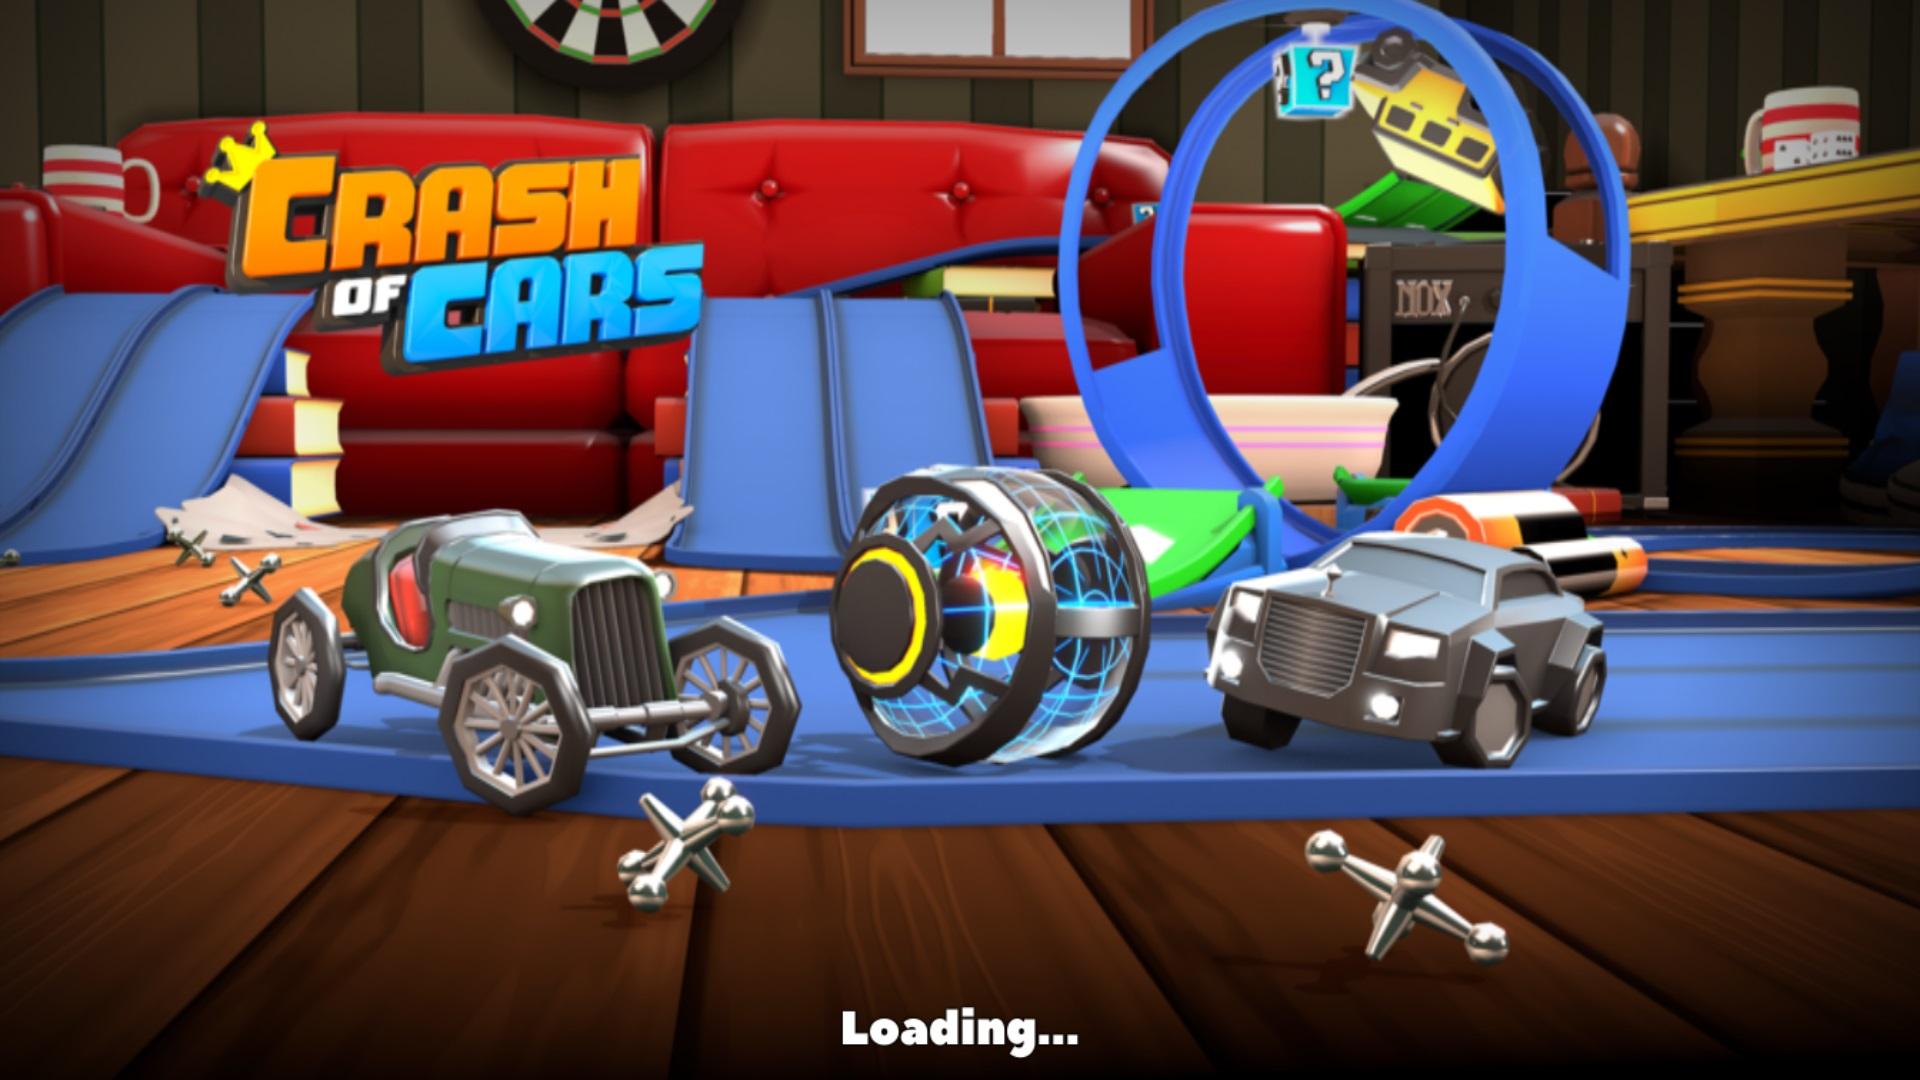 Cras of cars